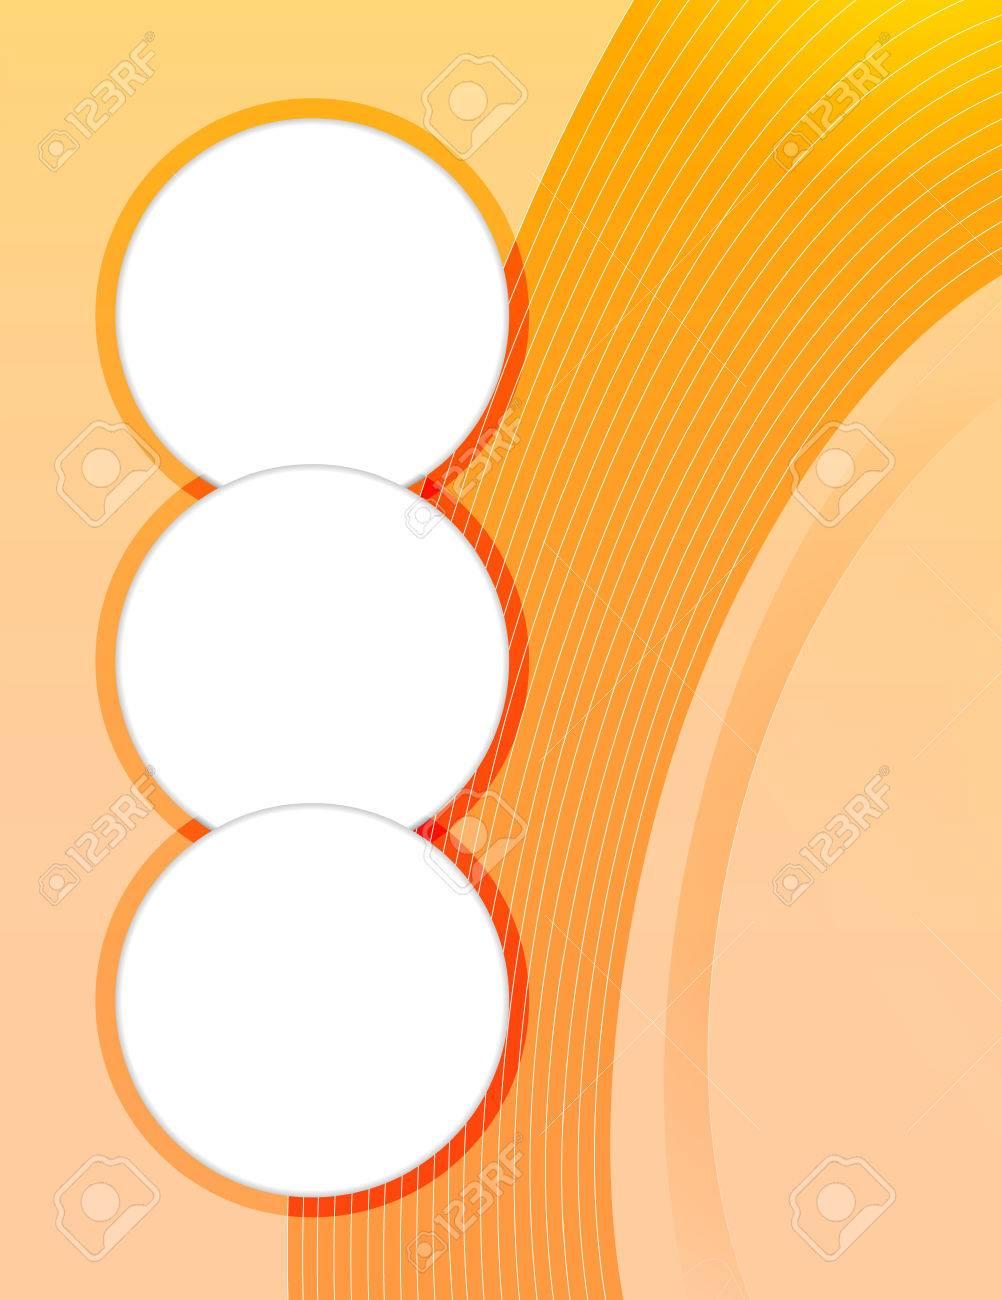 presentation of business poster flyer design content background